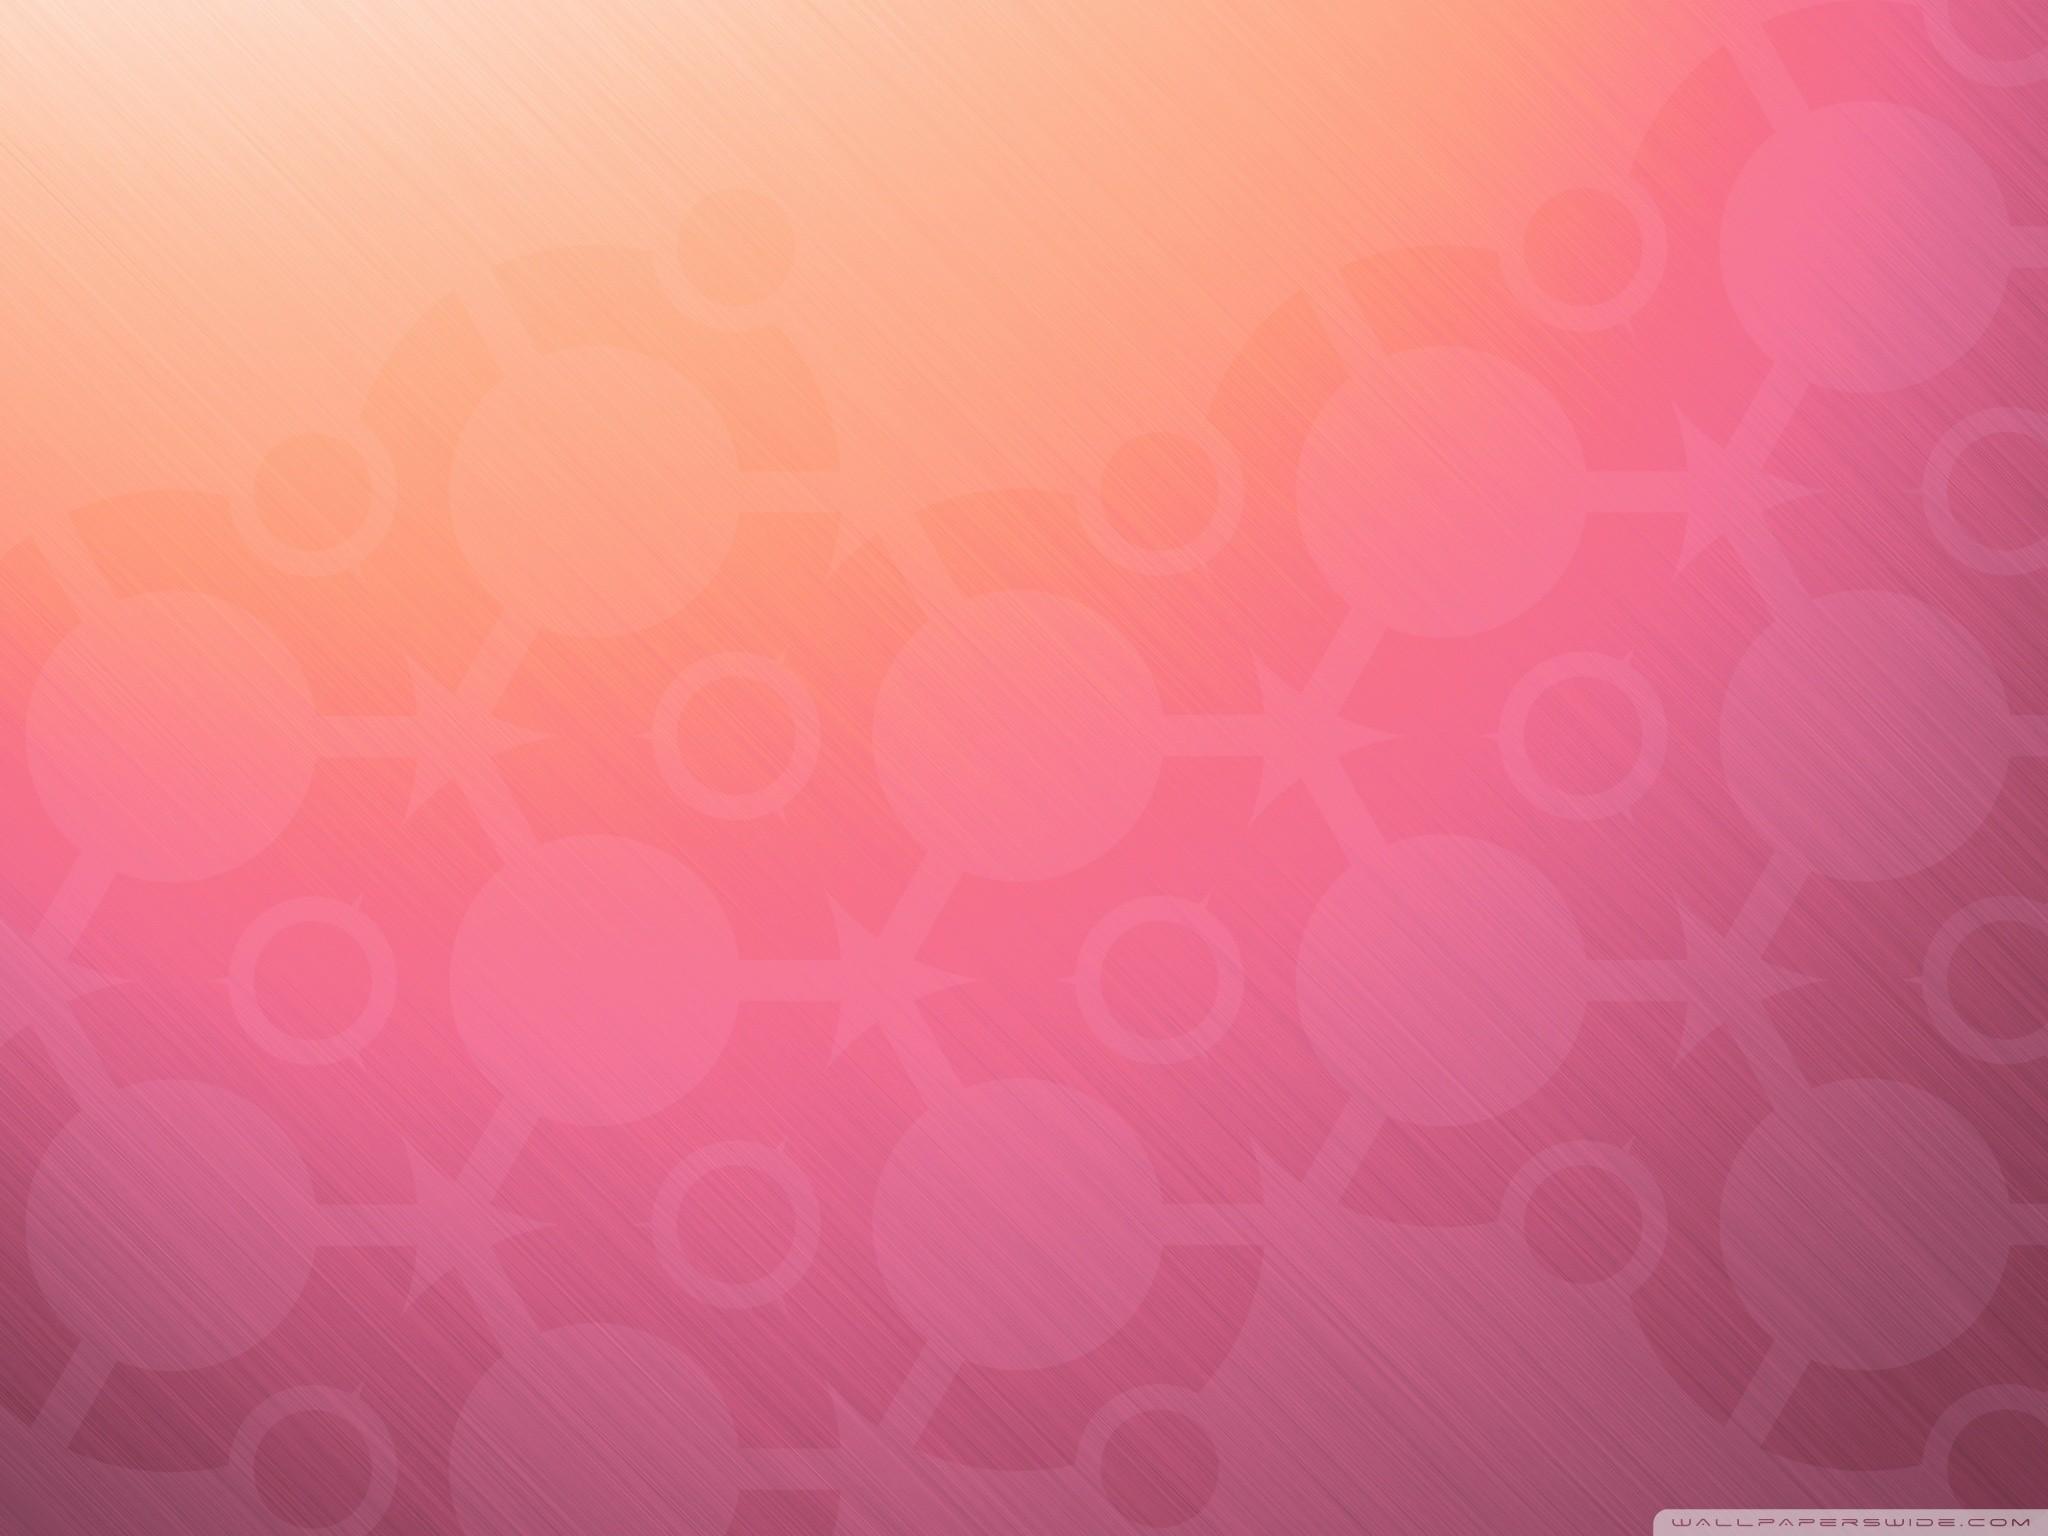 Ubuntu Flat Shadow Pink Wallpaper Technology HD Wallpapers